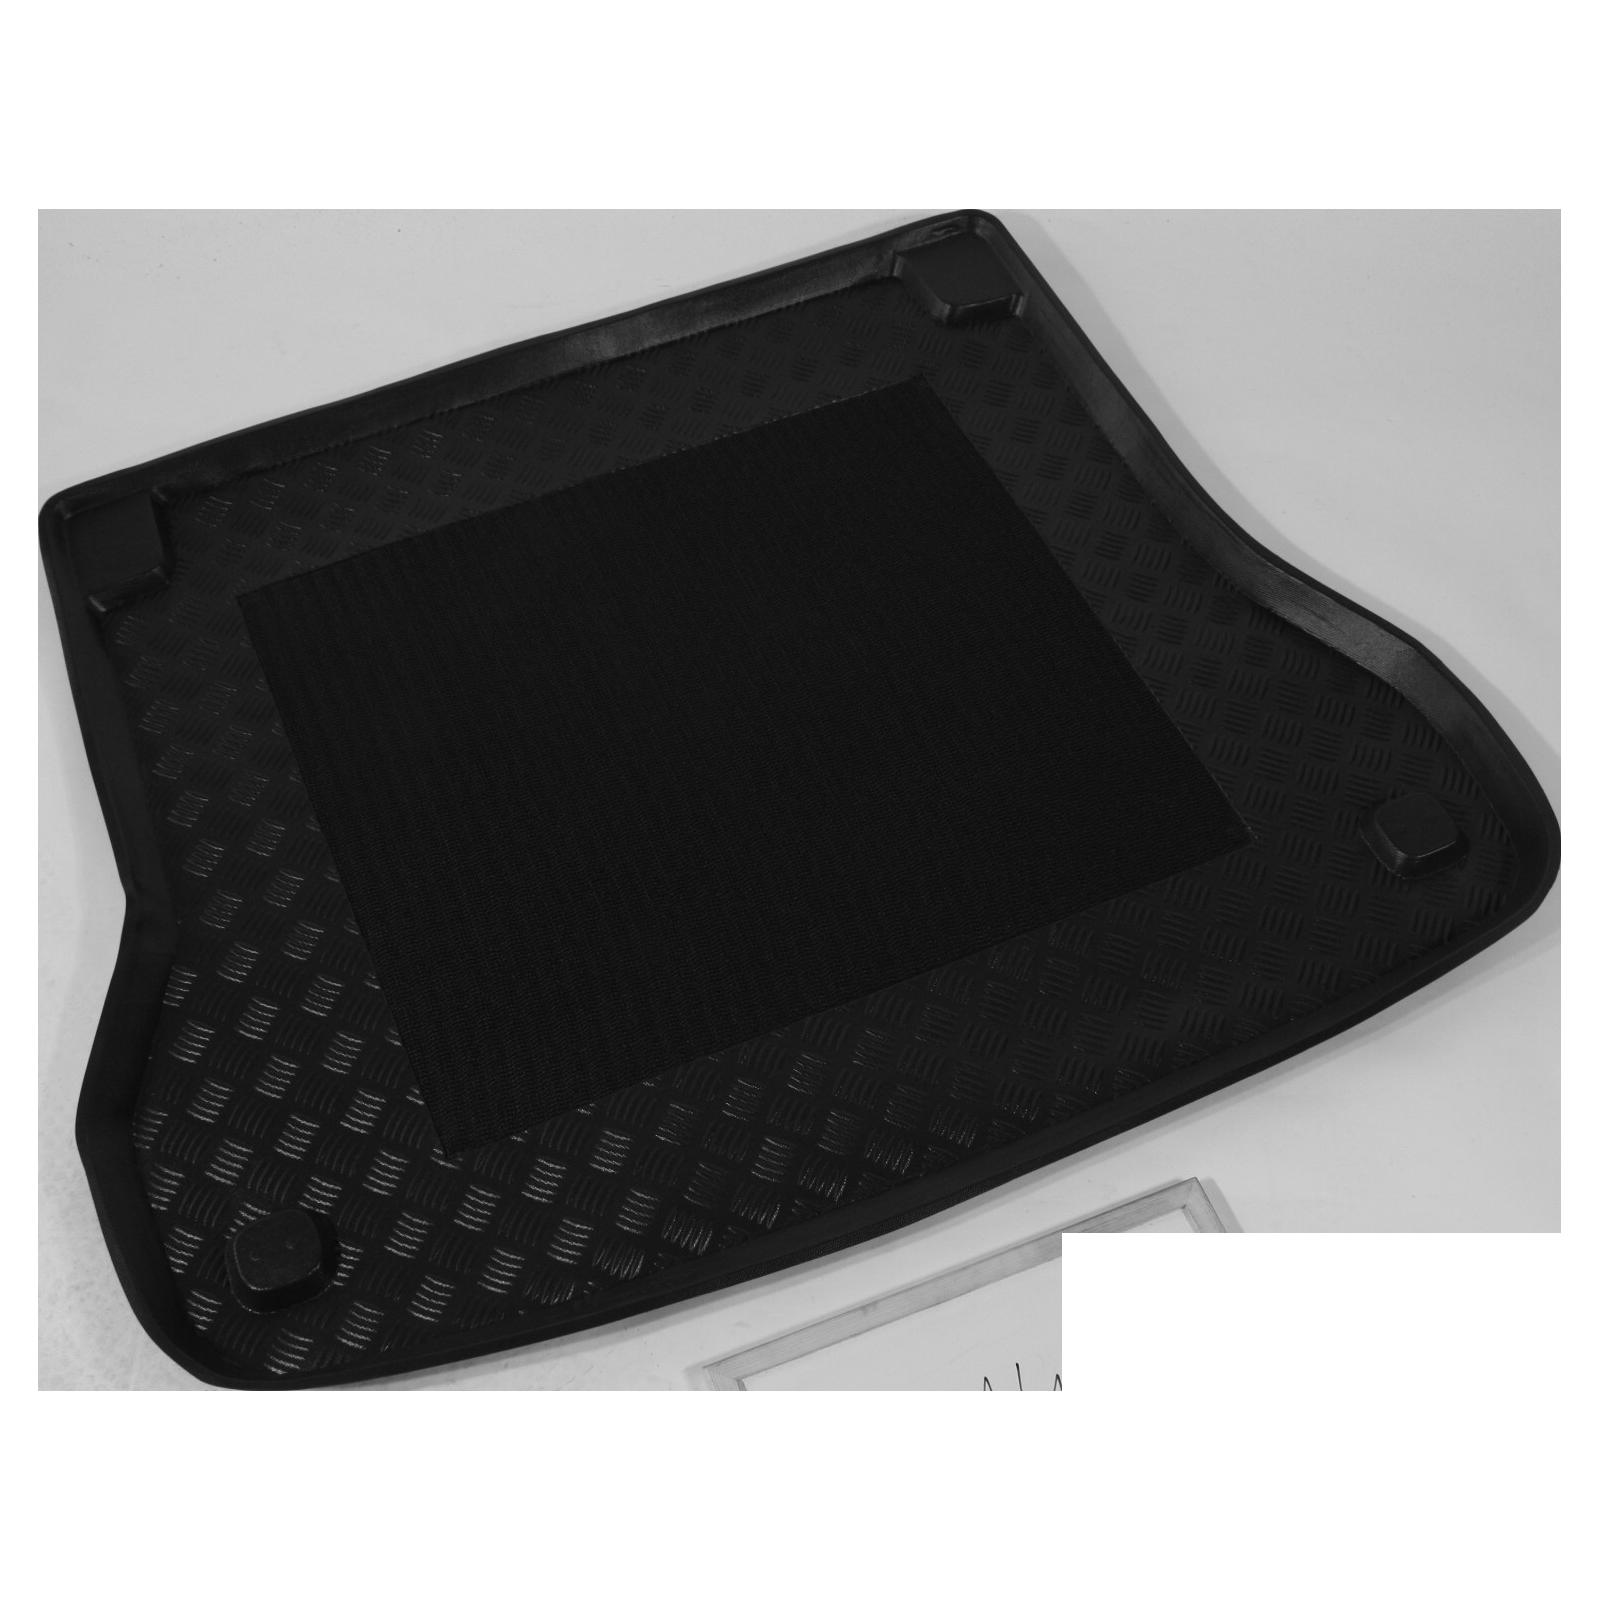 kofferraumwanne schwarz f r citro n c5 ii break bj. Black Bedroom Furniture Sets. Home Design Ideas